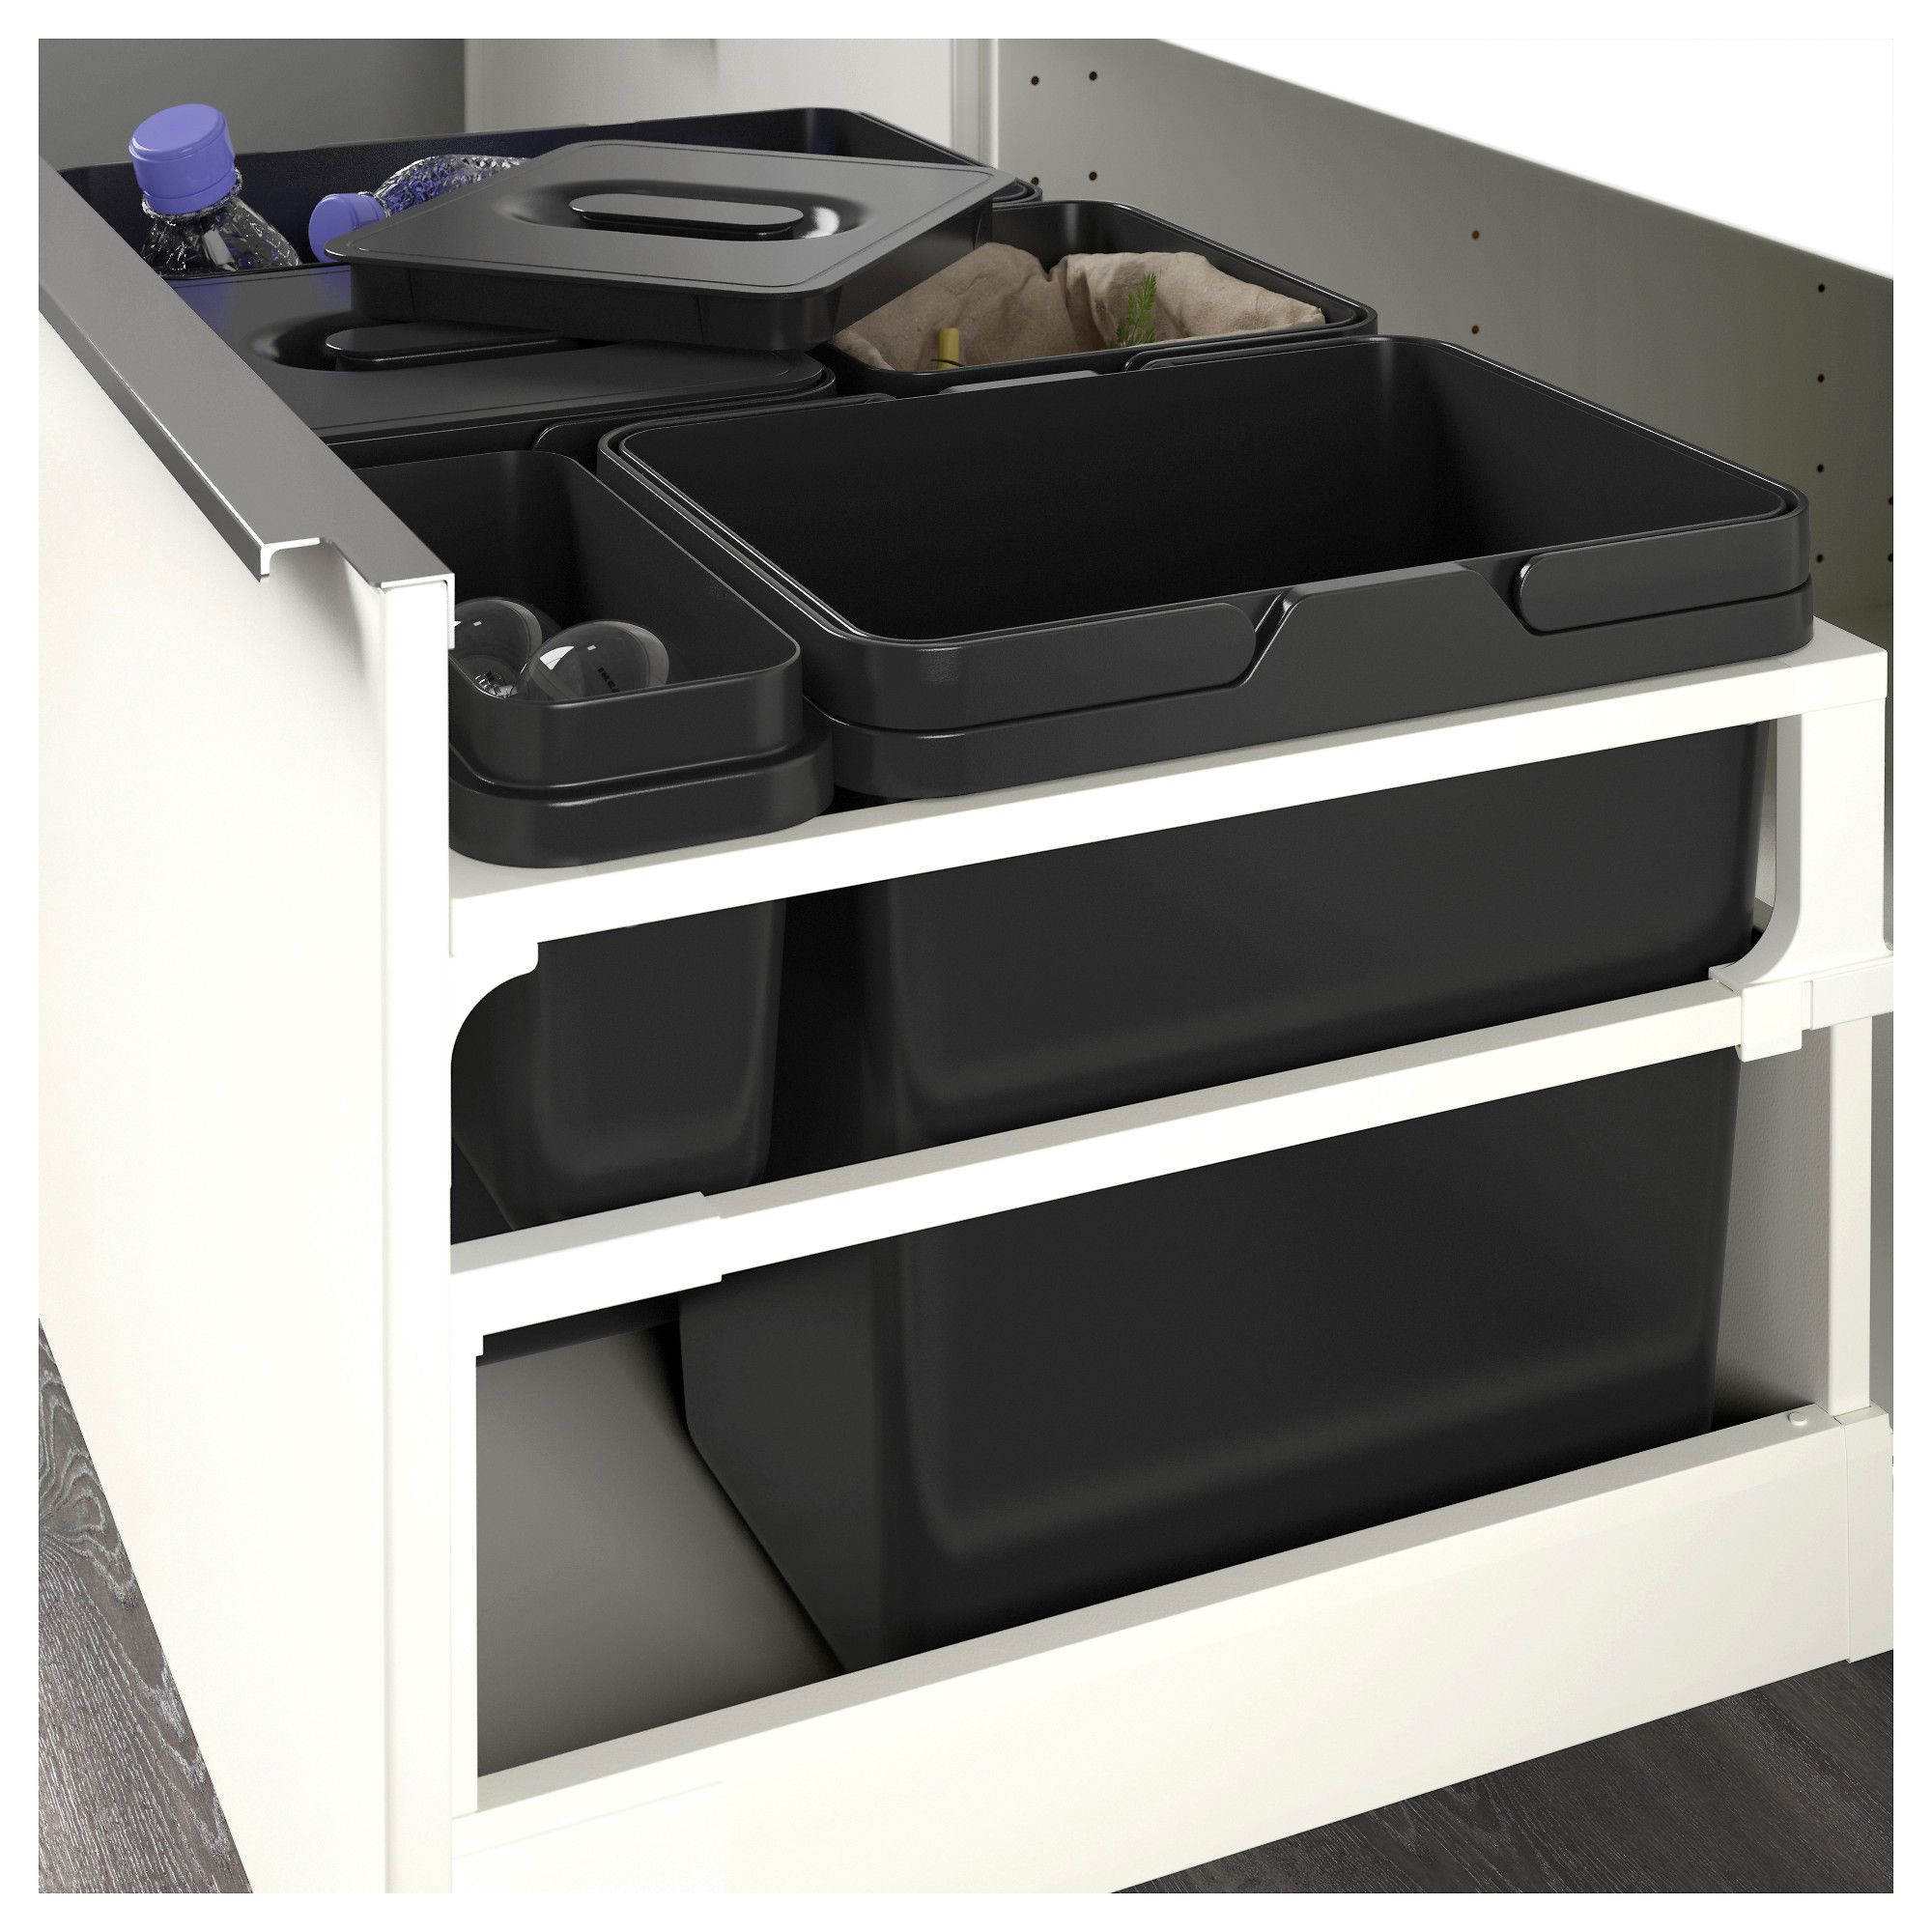 IKEA - VARIERA Recycling bin black  Recycling bins, Kitchen bin